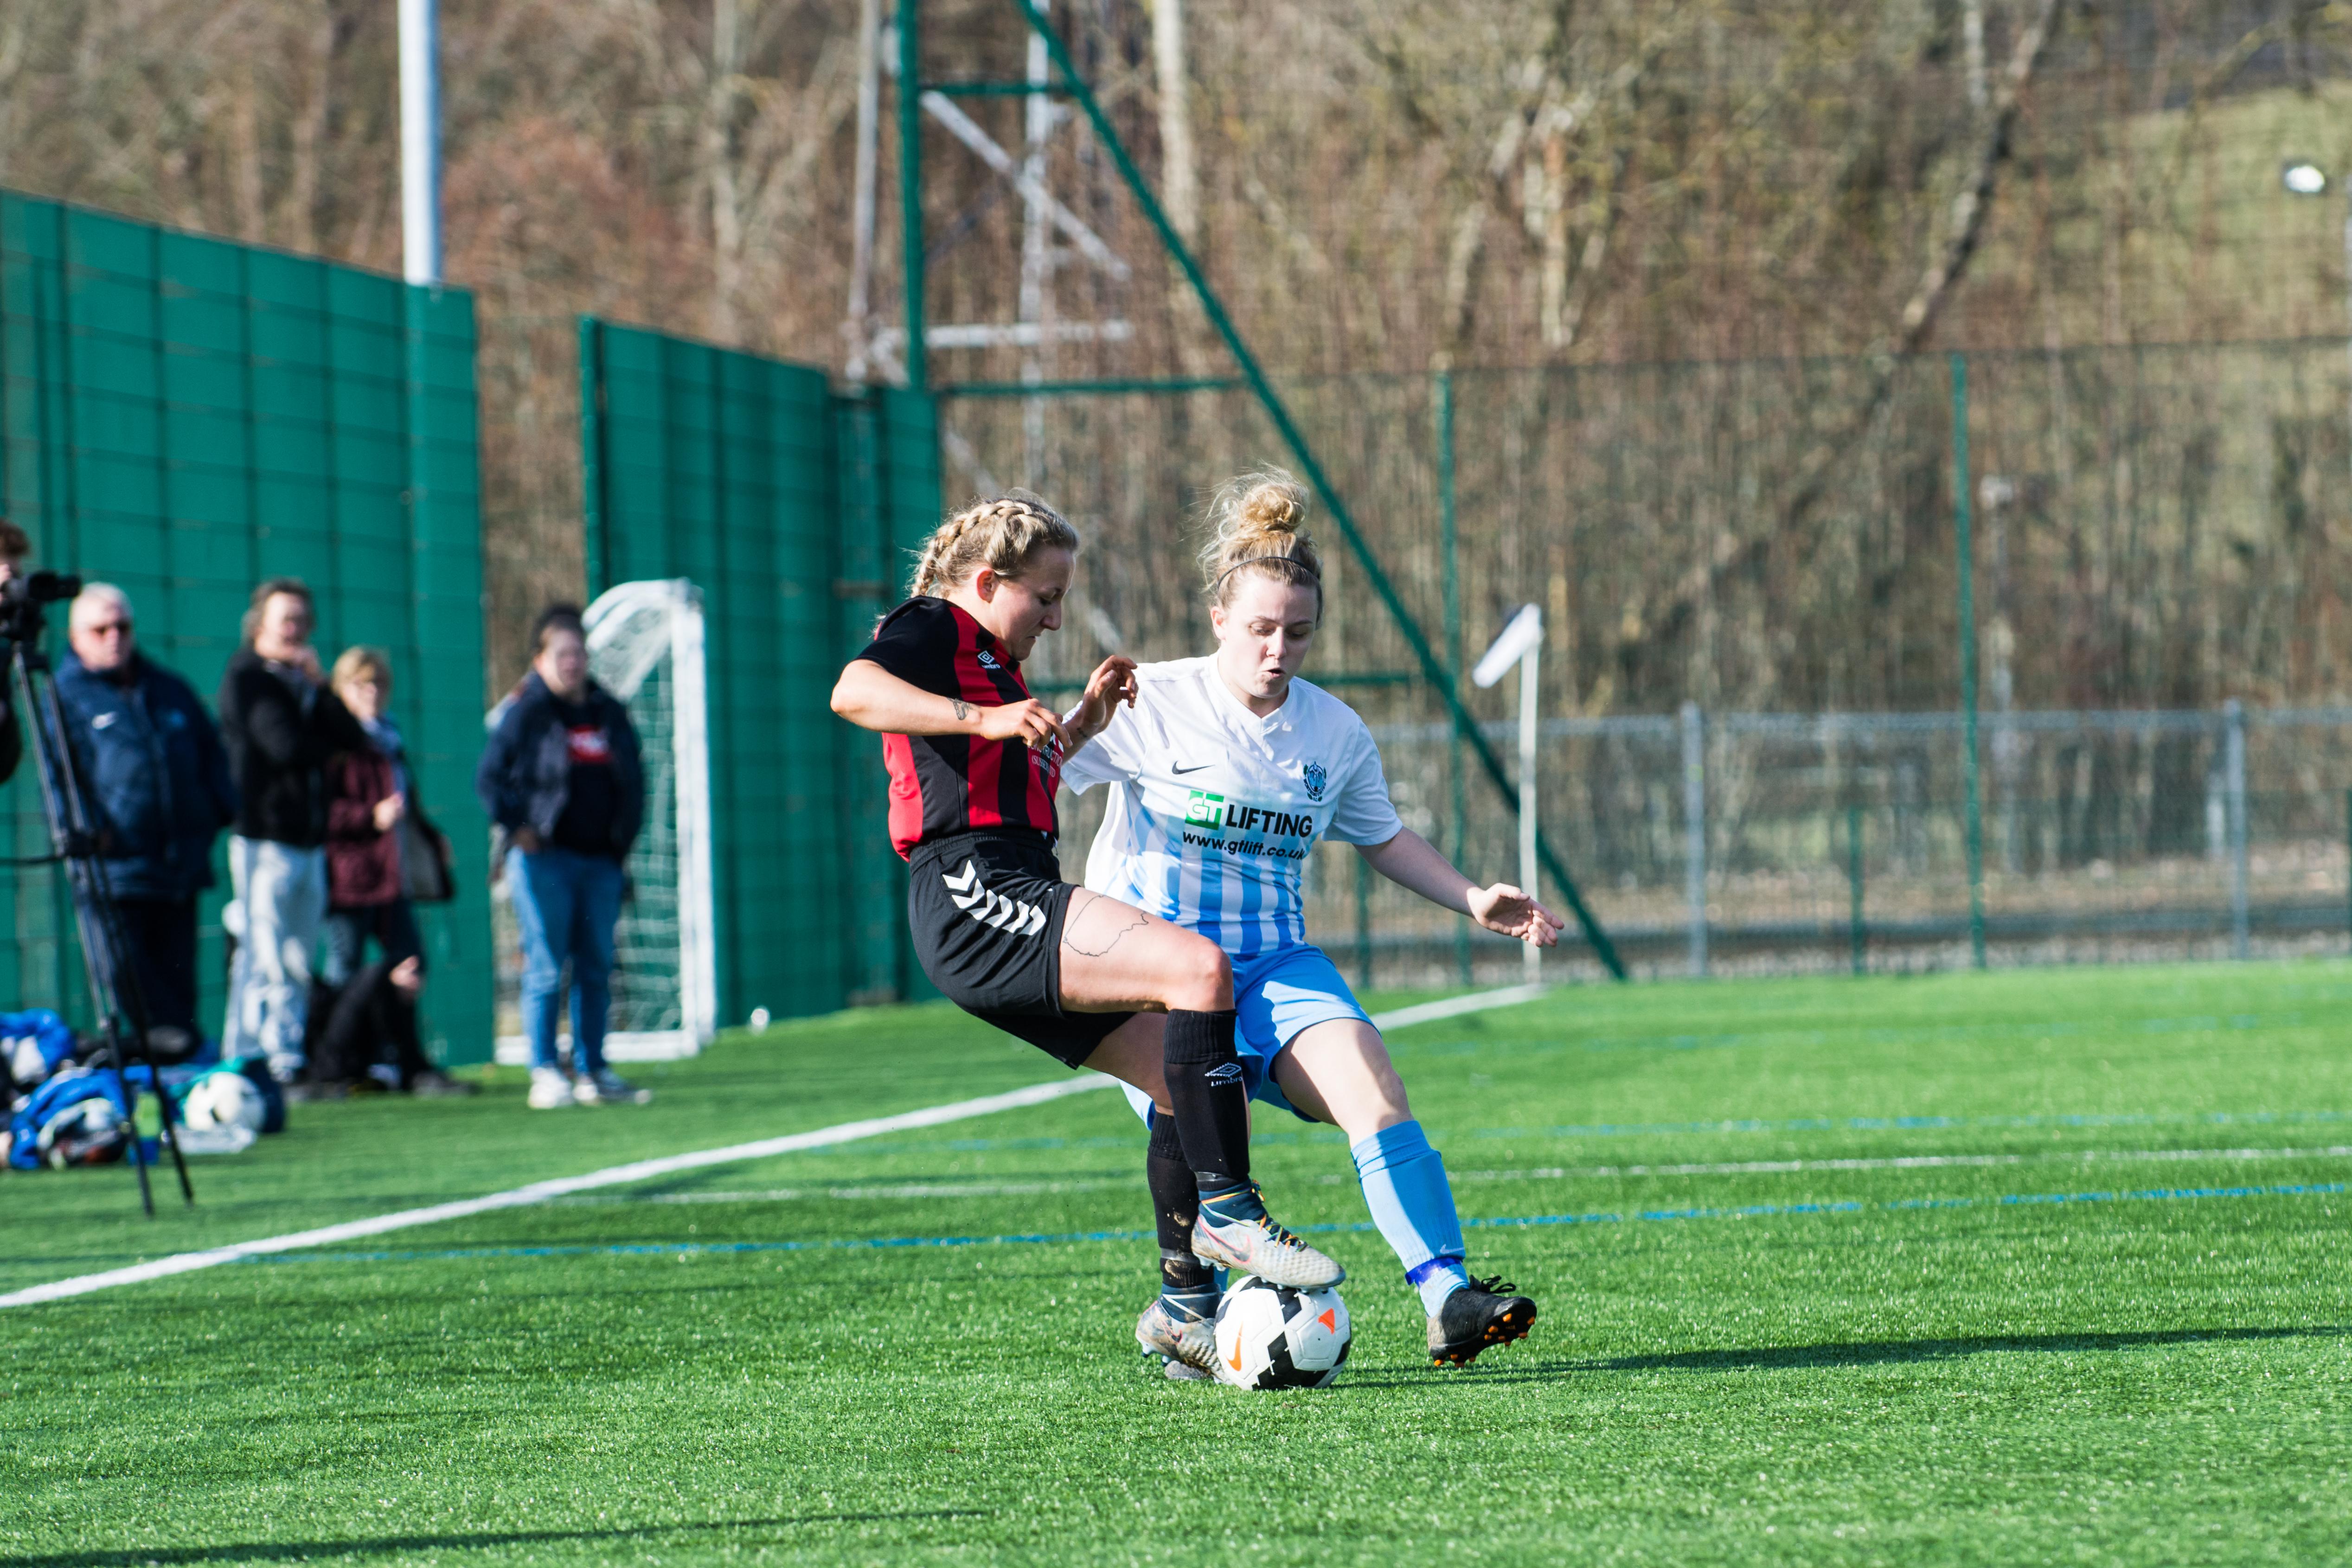 DAVID_JEFFERY Saltdean Utd Ladies FC vs Worthing Utd Ladies FC 11.03.18 23